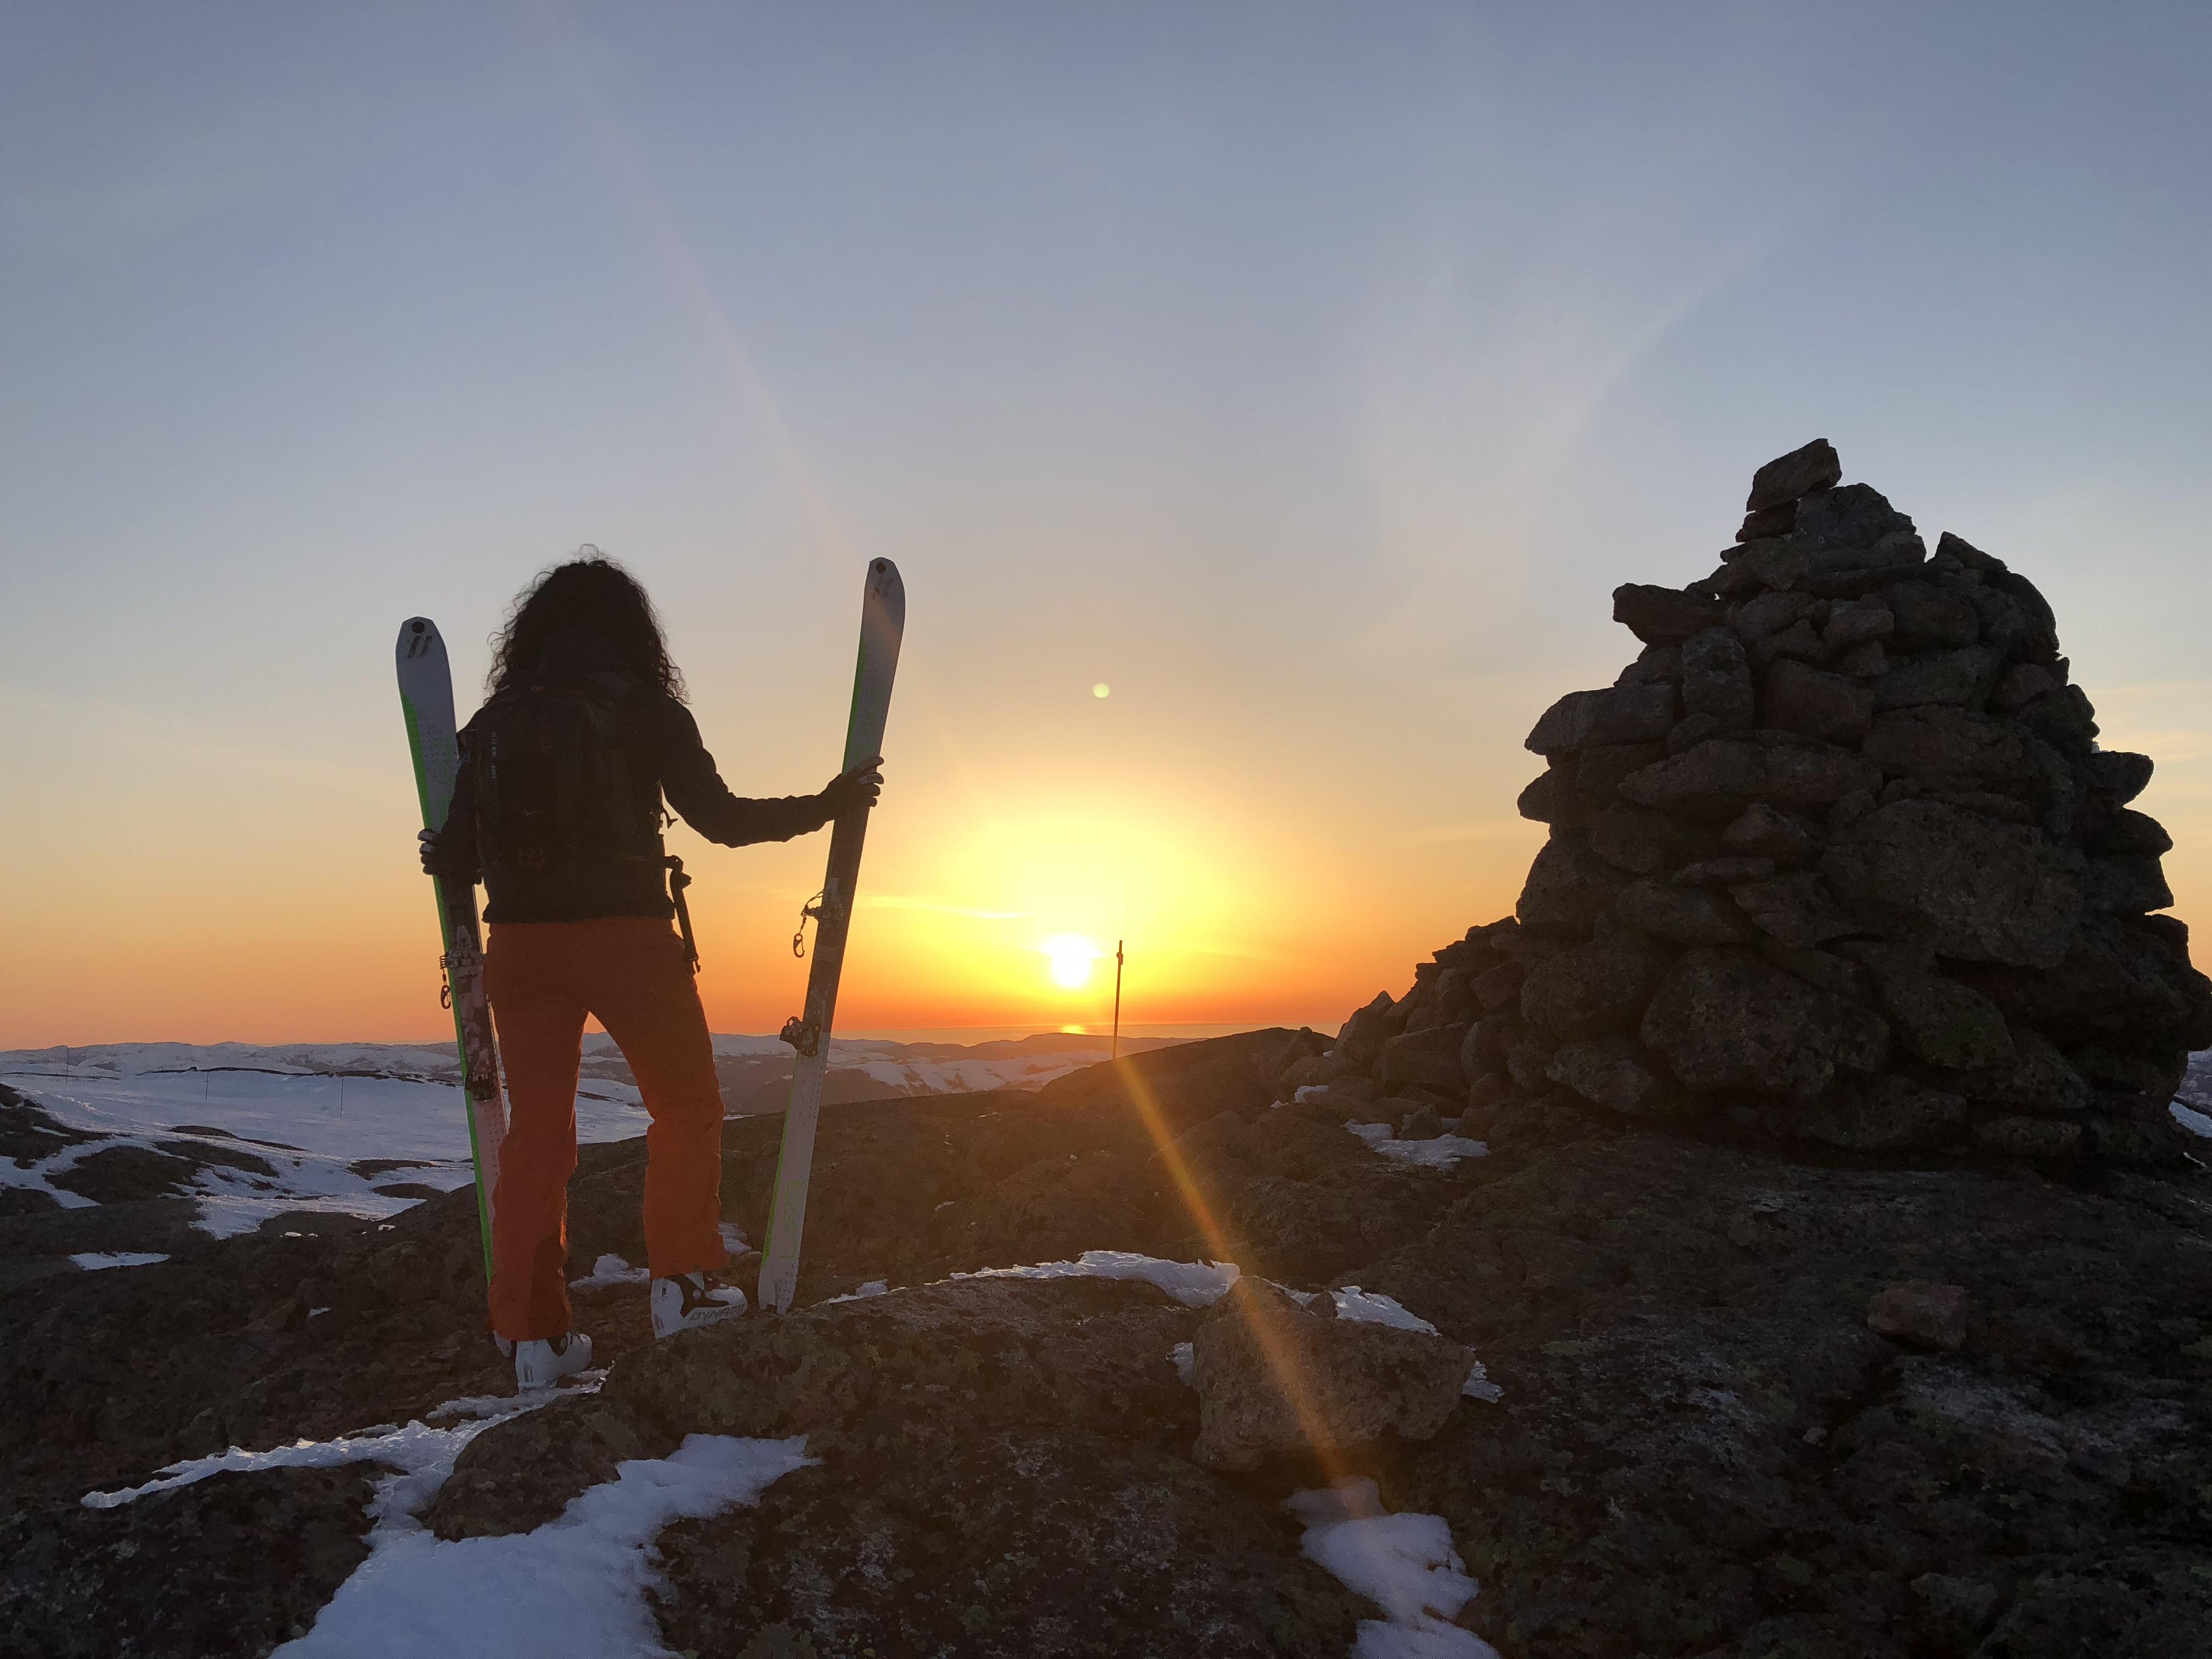 Ski touring during the winter in Namdalen. Hemna mountain.